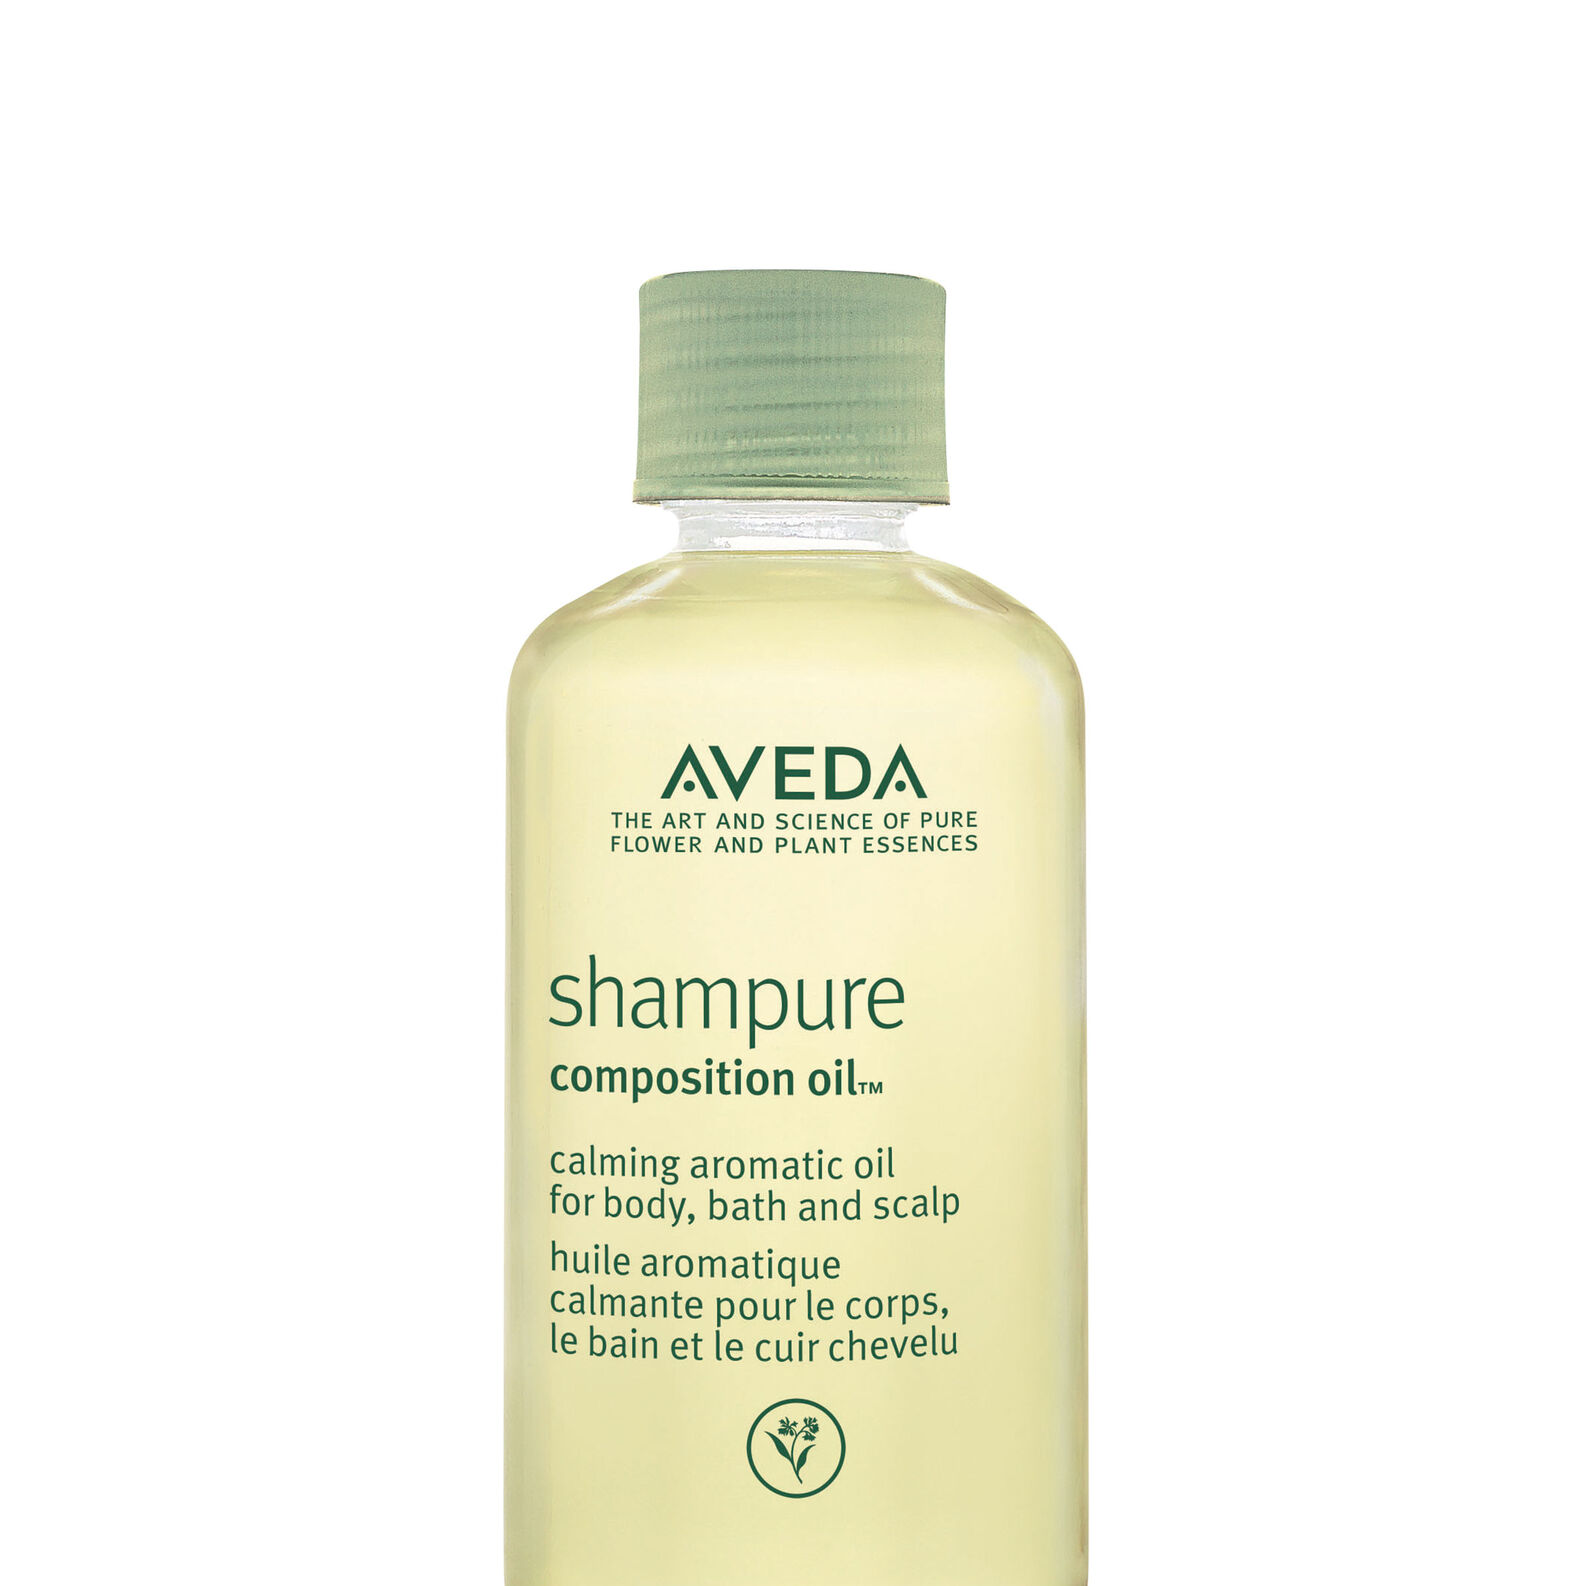 AVEDA SHAMPURE COMPOSITION 60 ML